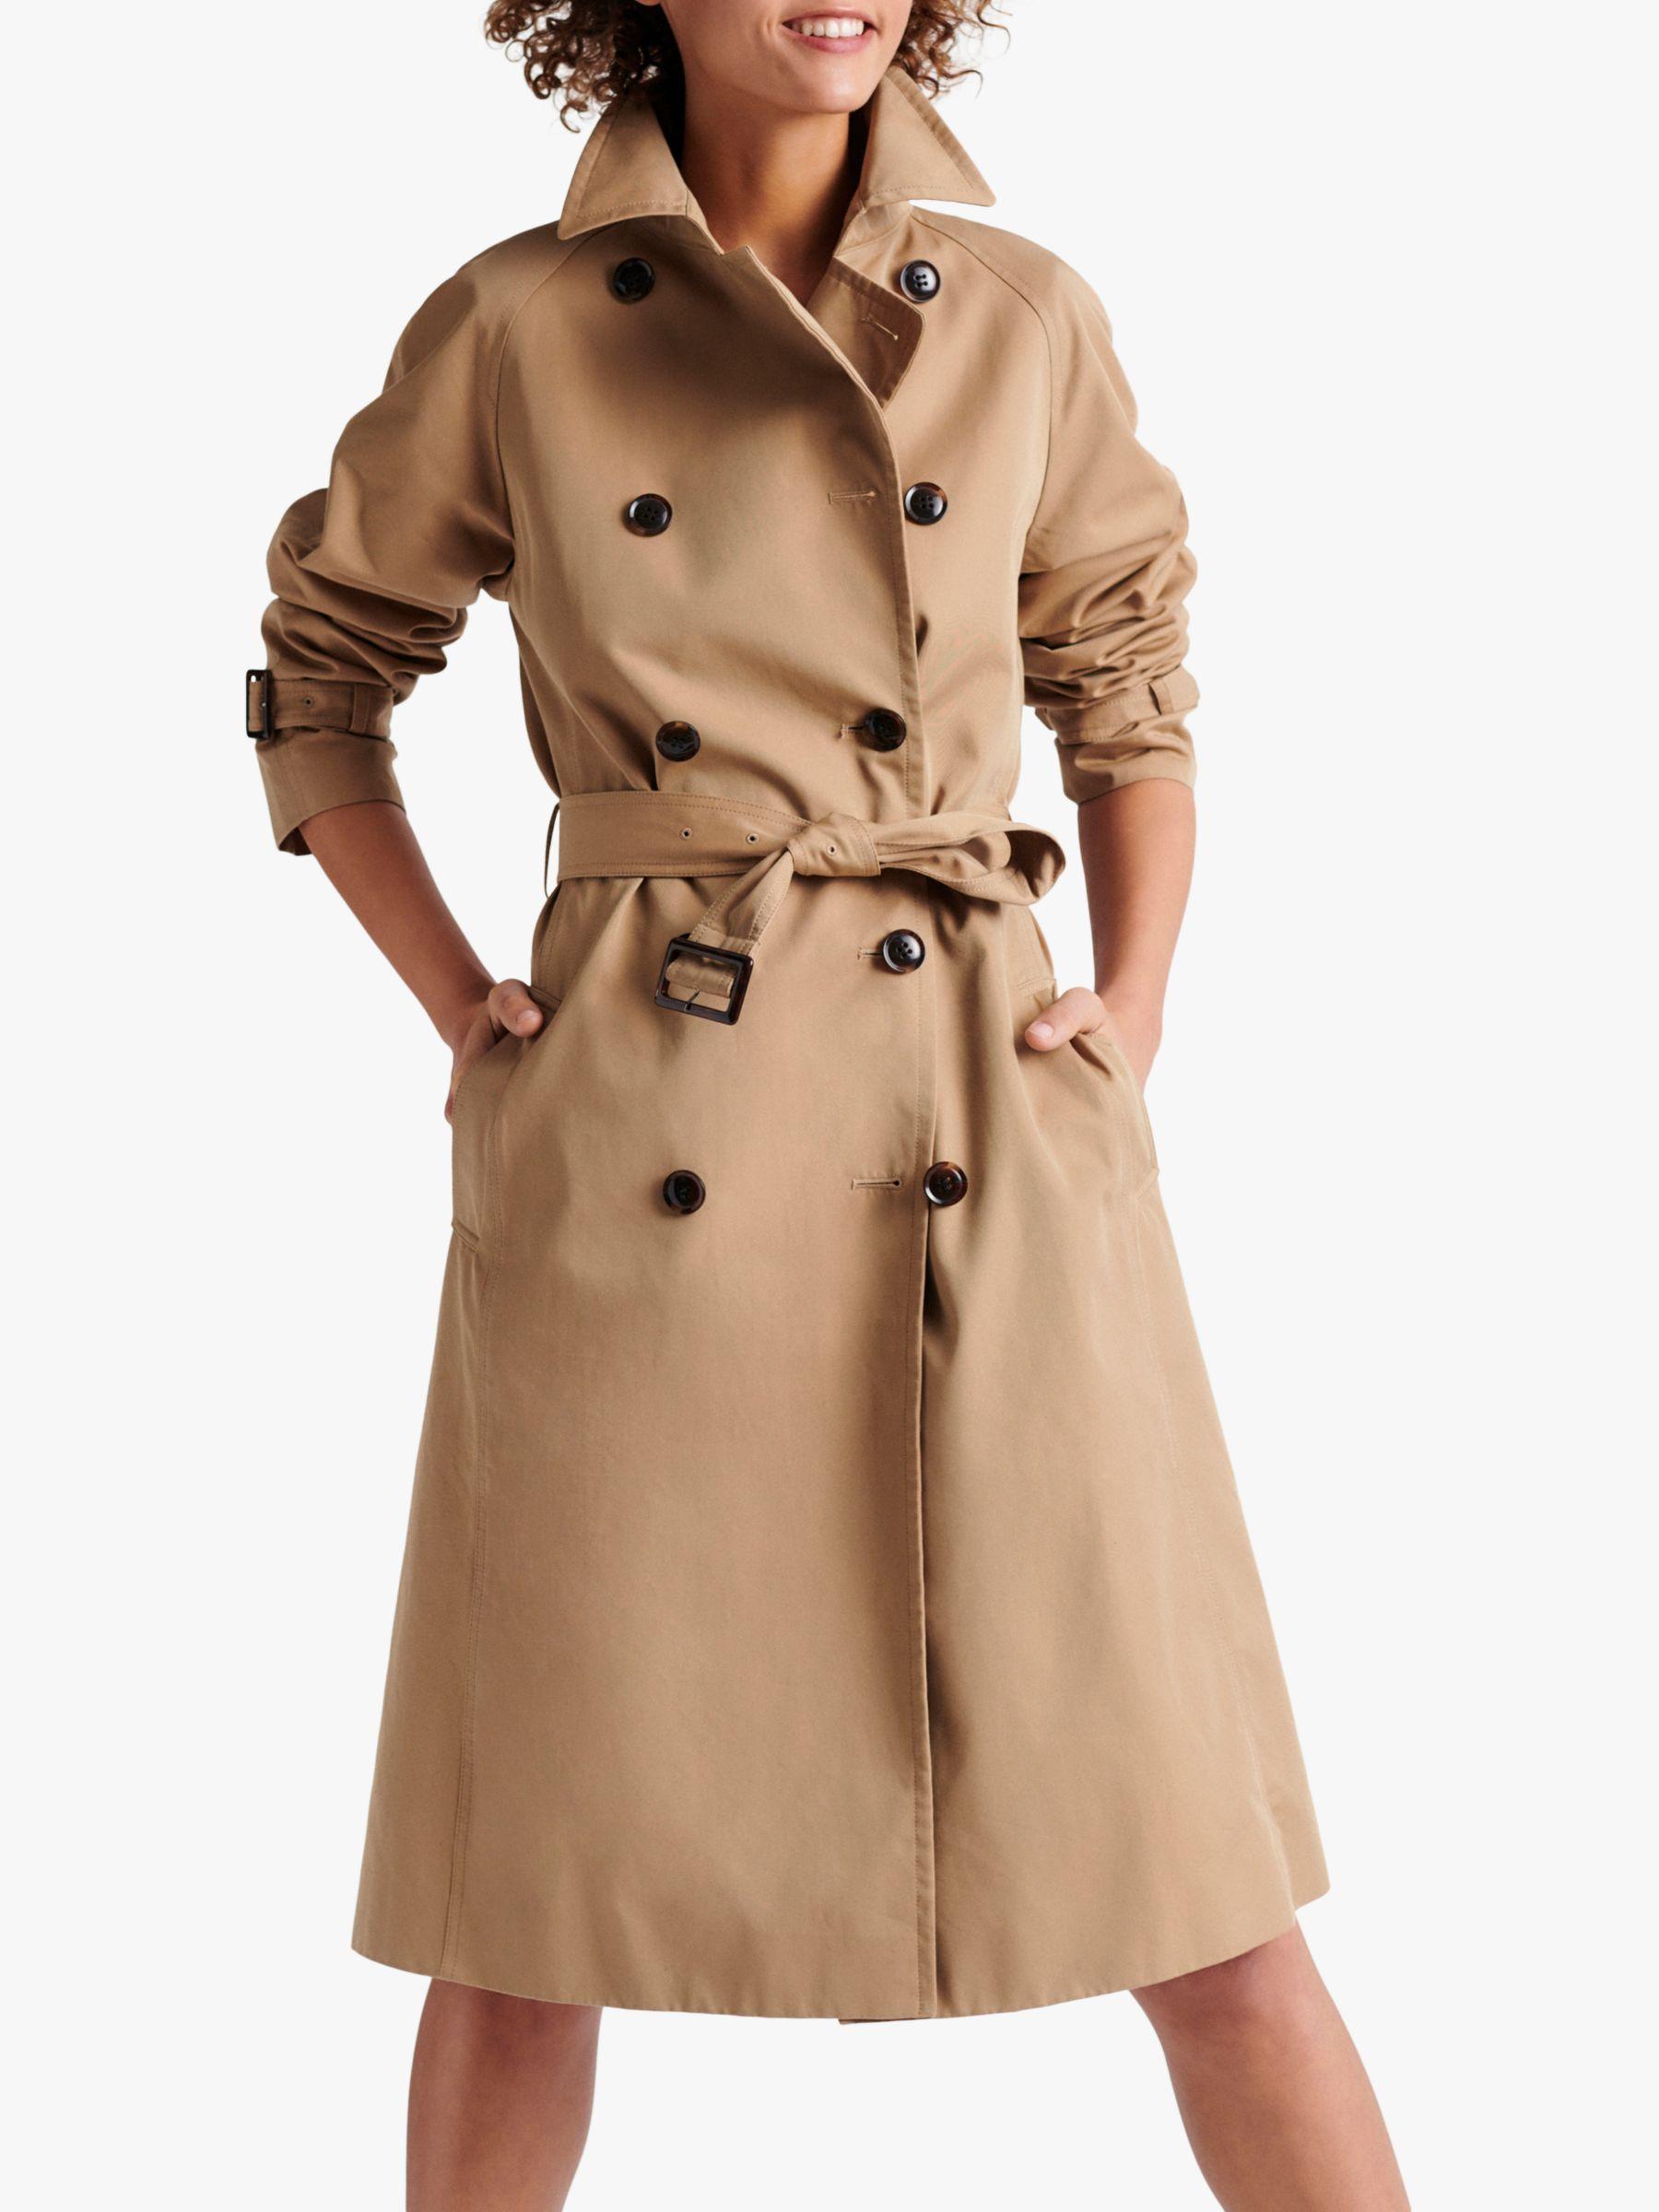 Gerard Darel Gerard Darel Domenica Double Breasted Trench Coat, Camel